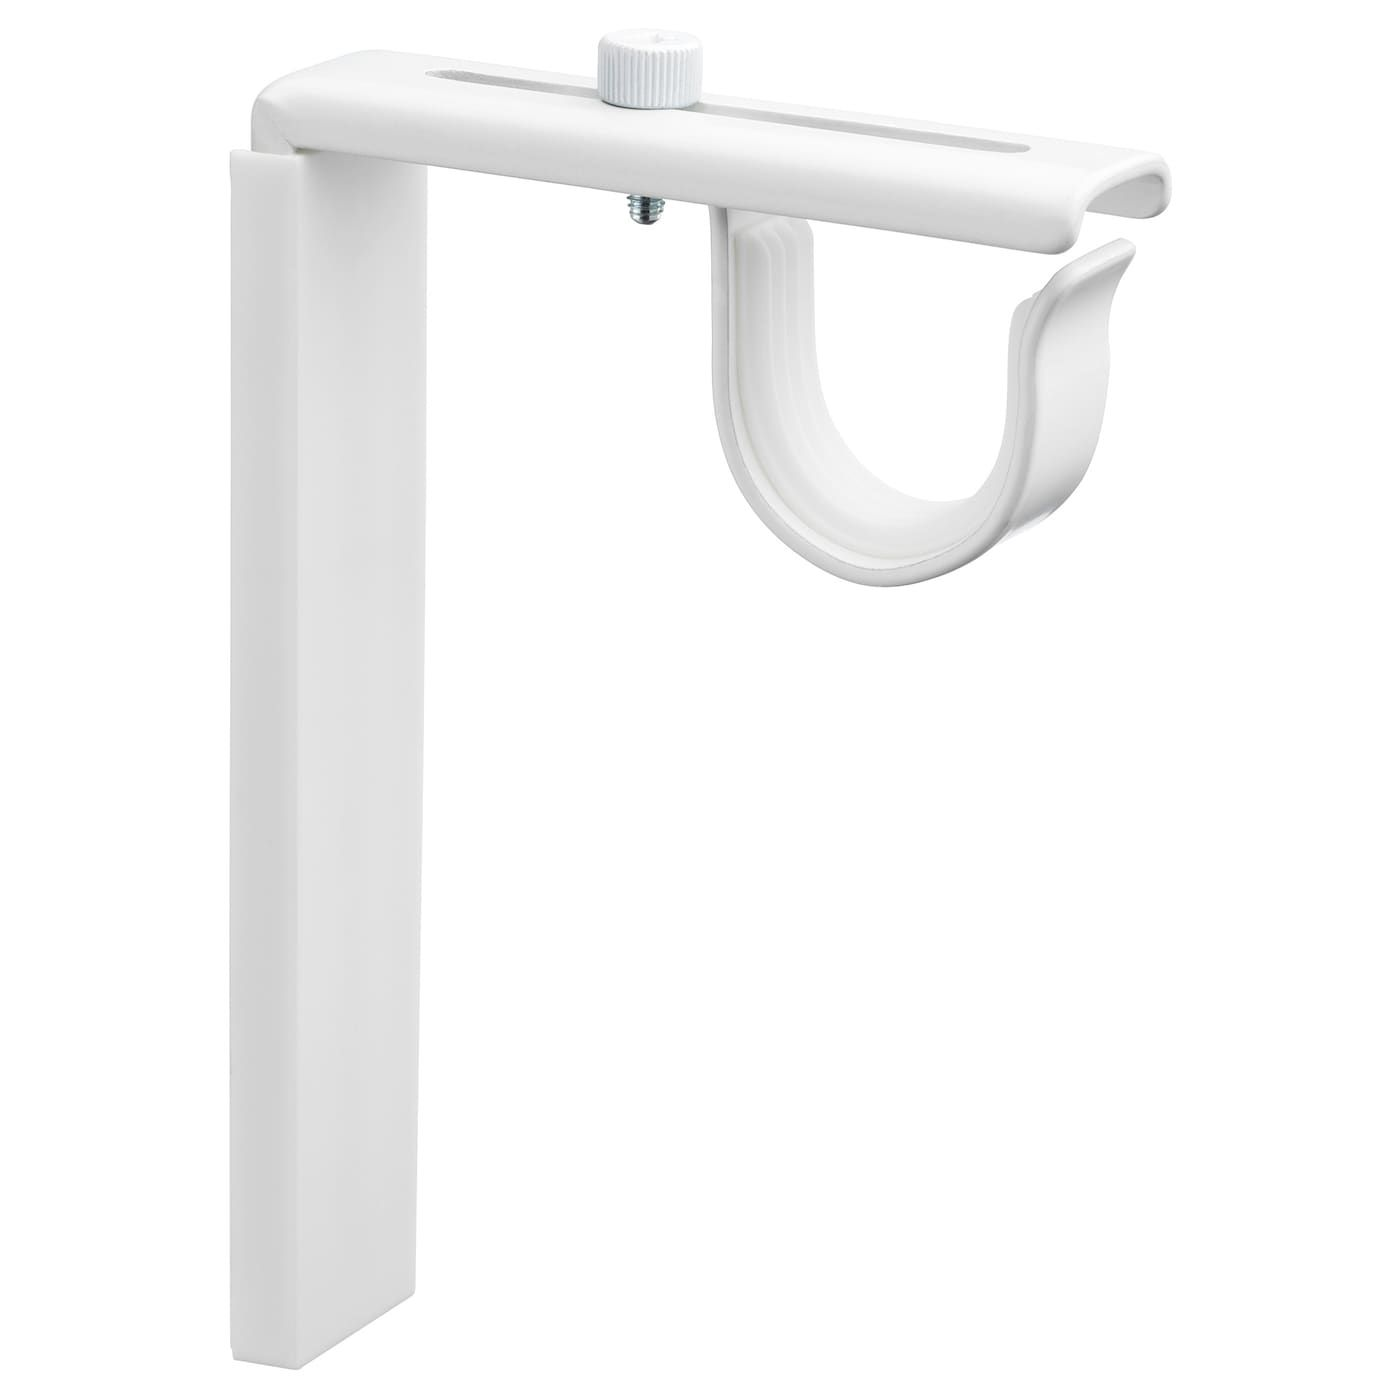 Windoware White Pvc Curtain Rod Bracket 2 Pack Curtain Rods